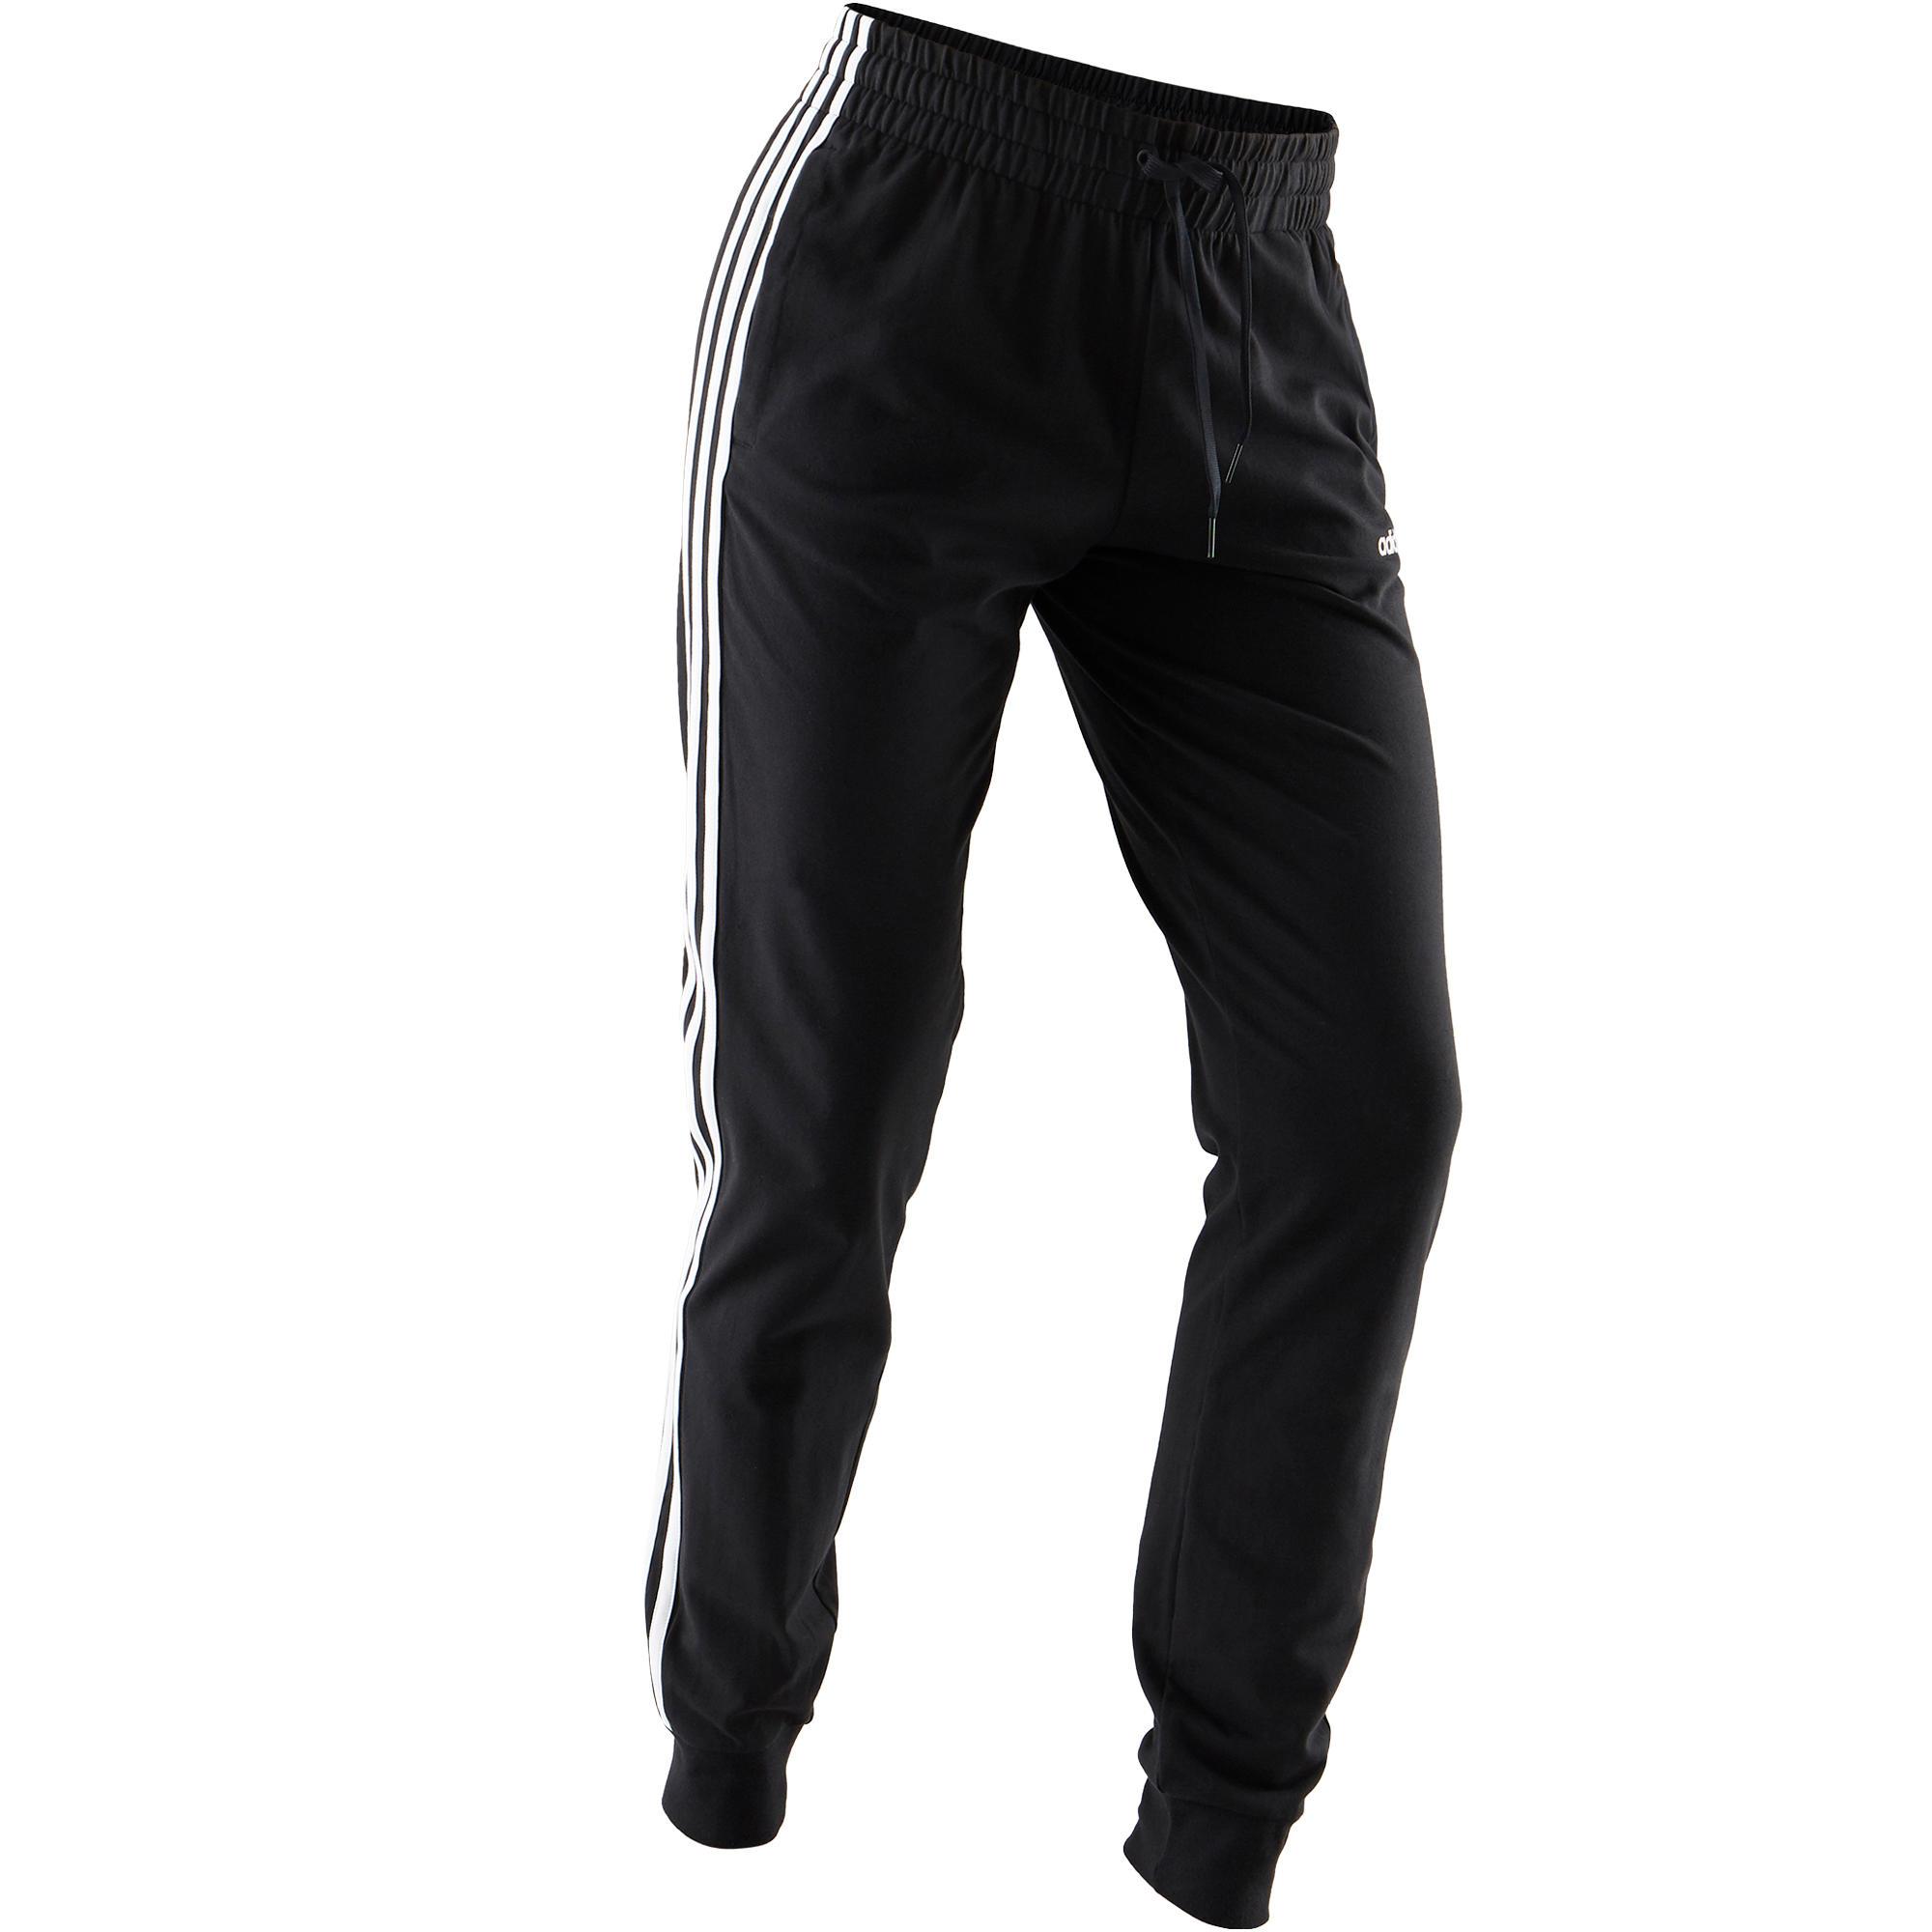 pantalon adidas sport femme